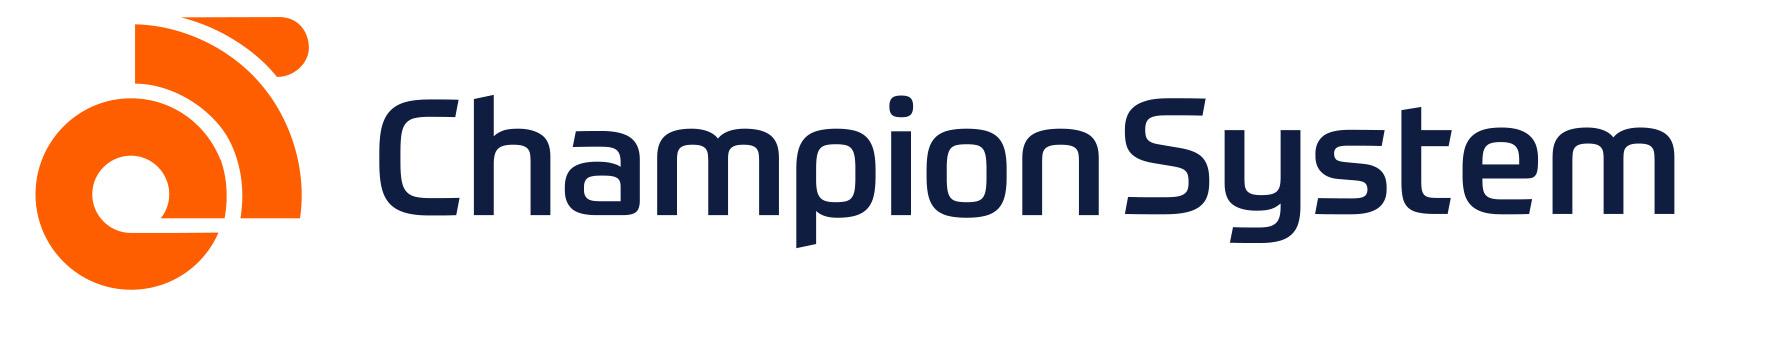 Champion System LOGO 2020Use